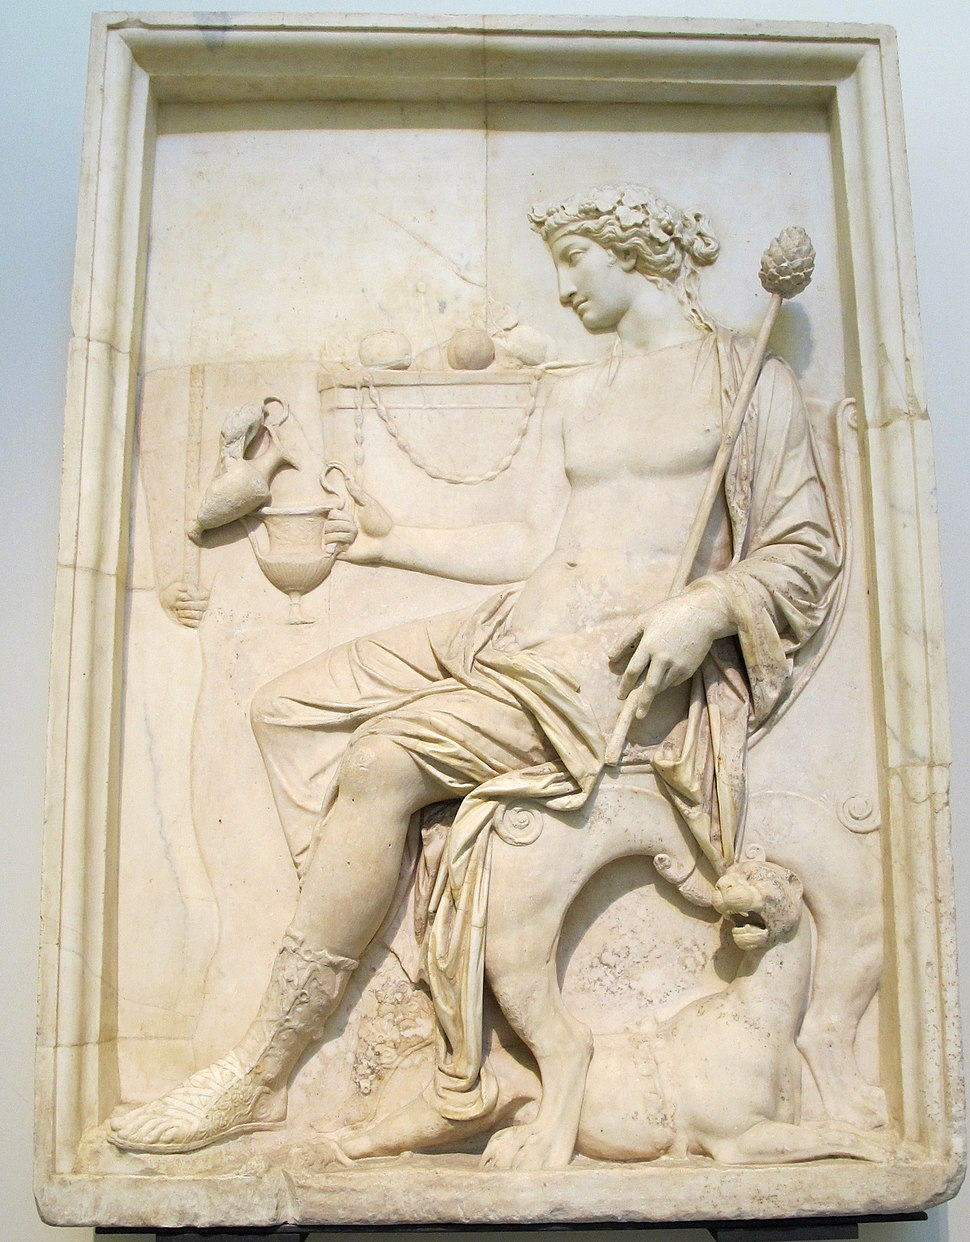 Dioniso seduto, officina neoattica, I sec dc, 6728